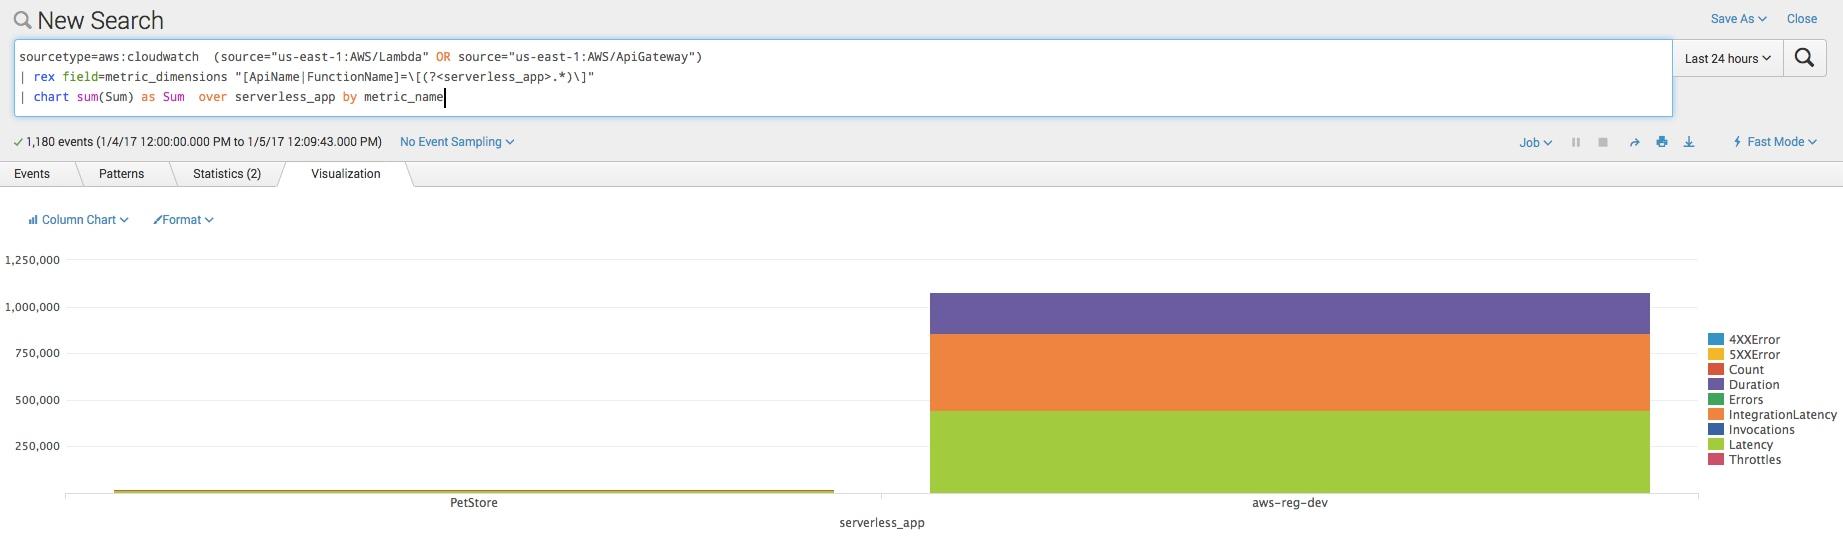 Splunk and AWS: Monitoring & Metrics in a Serverless World